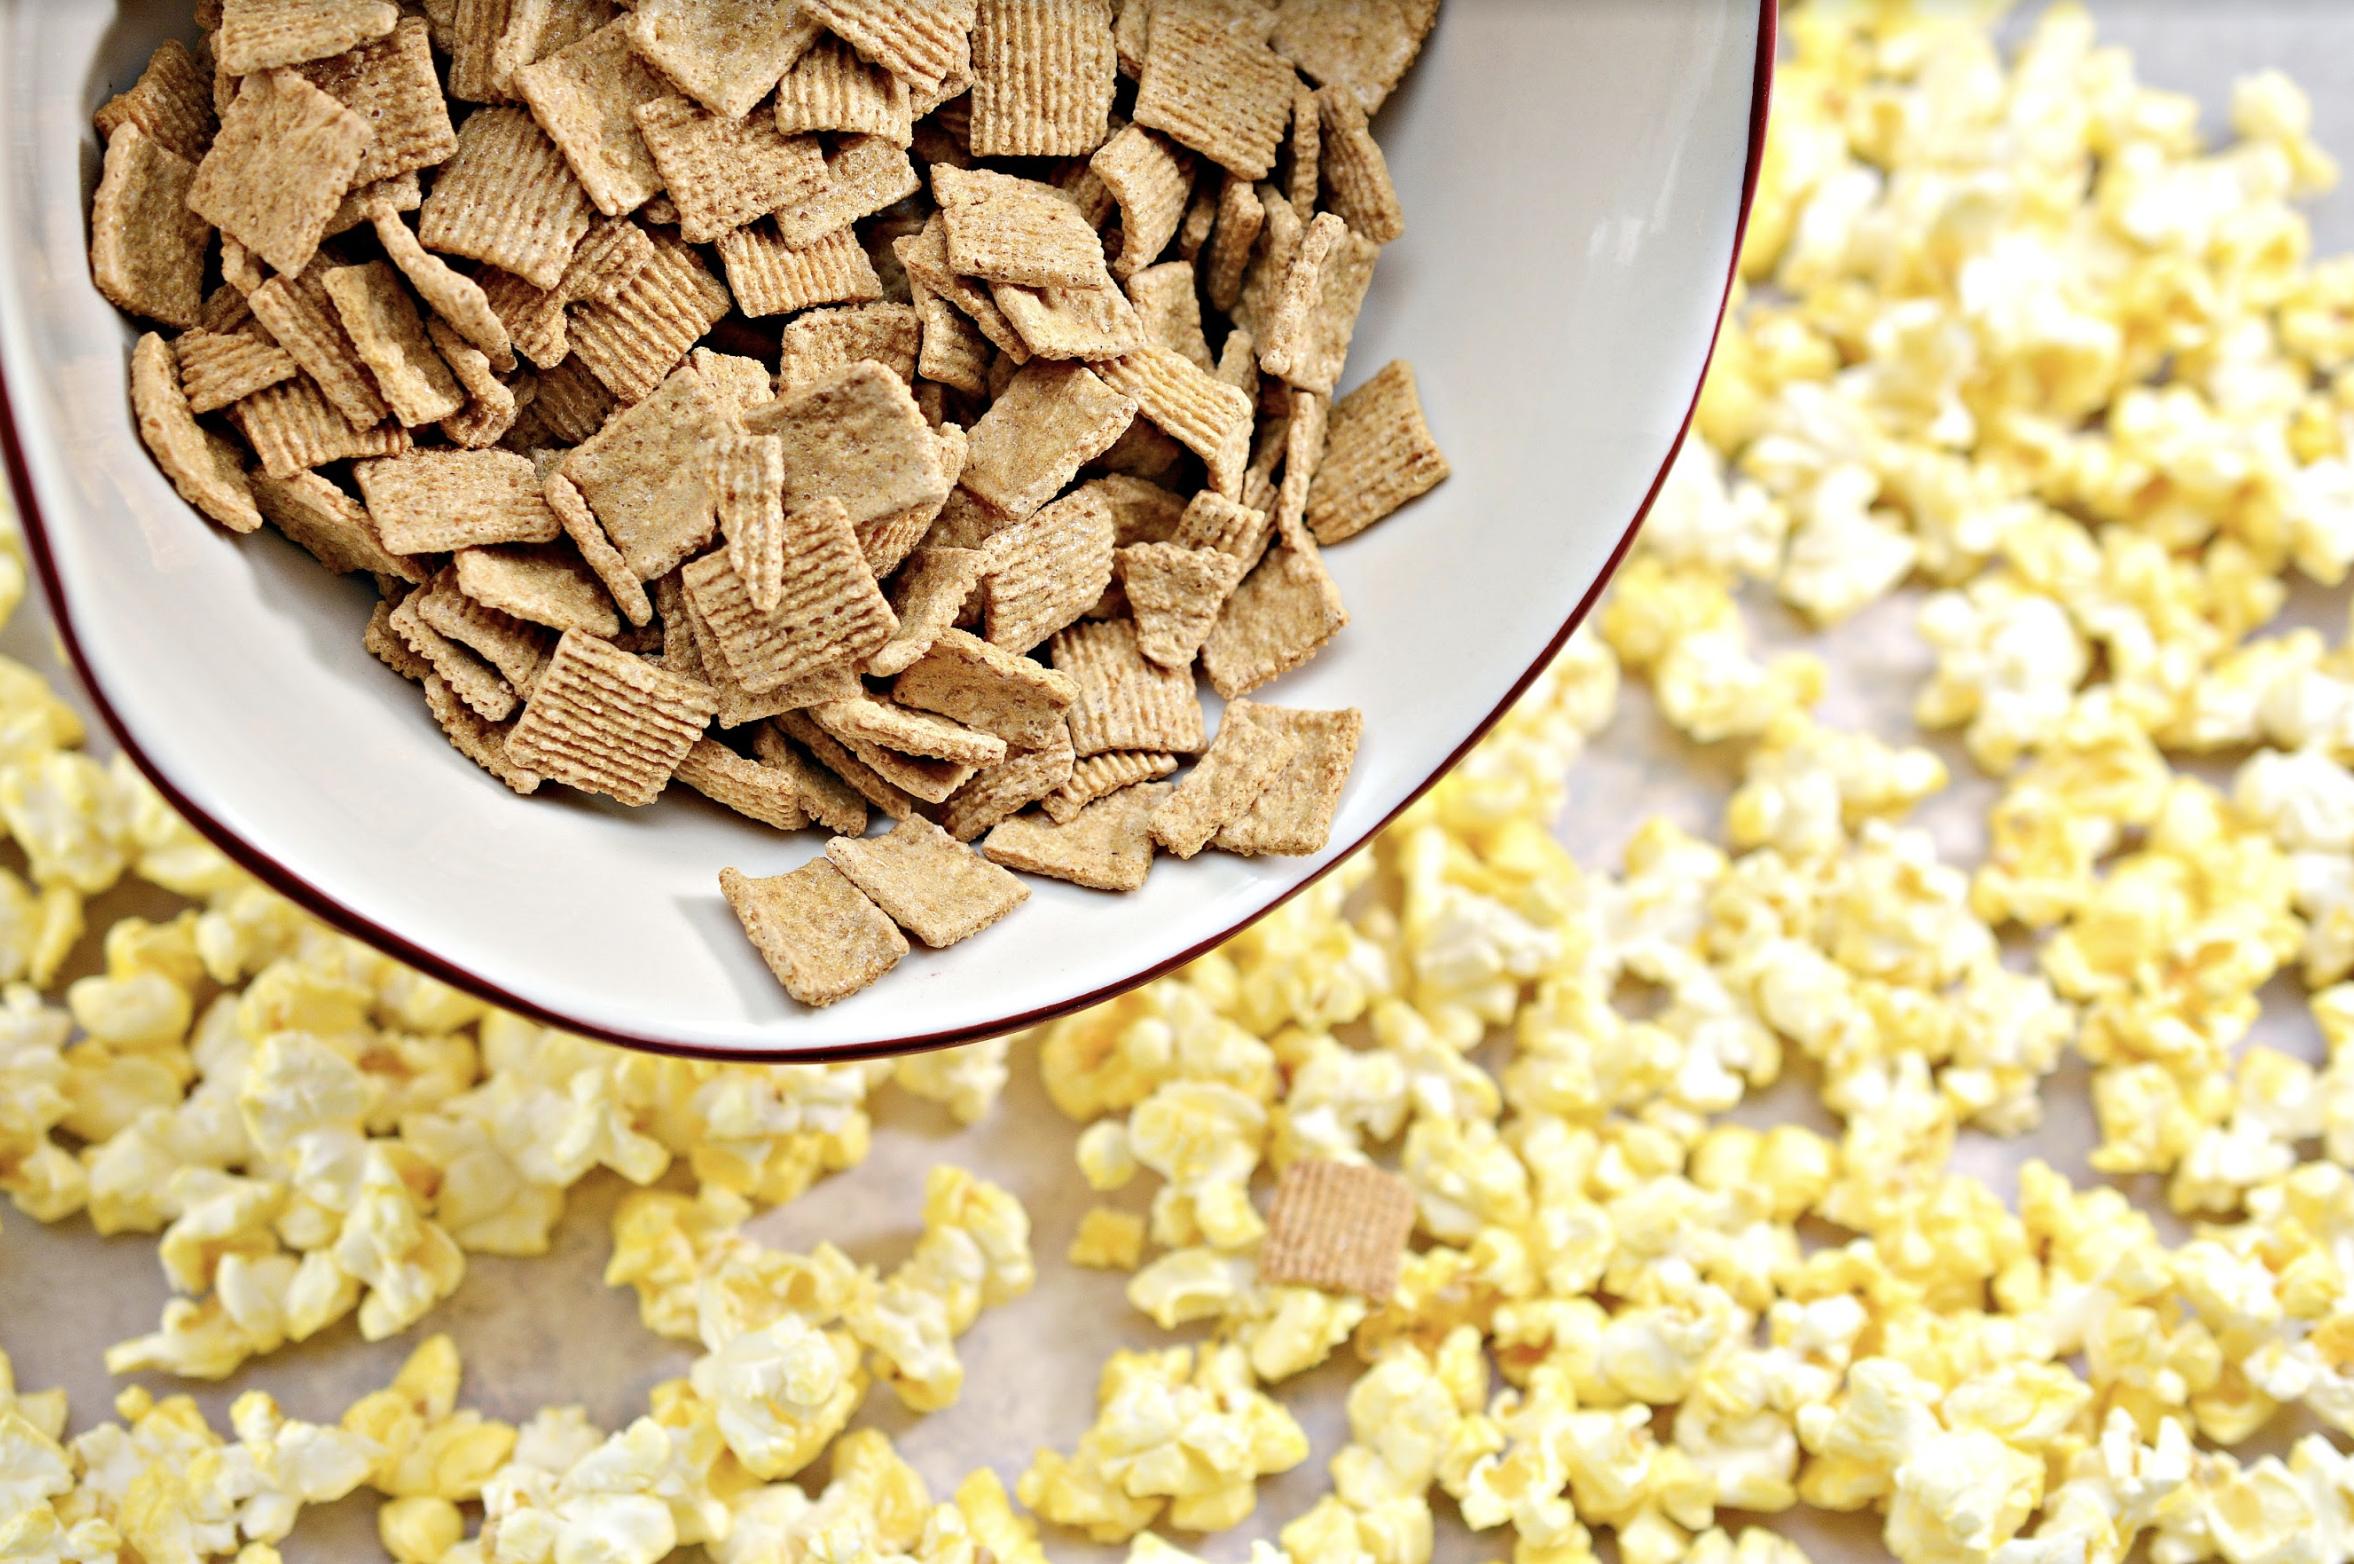 How to make S'mores Caramel Popcorn